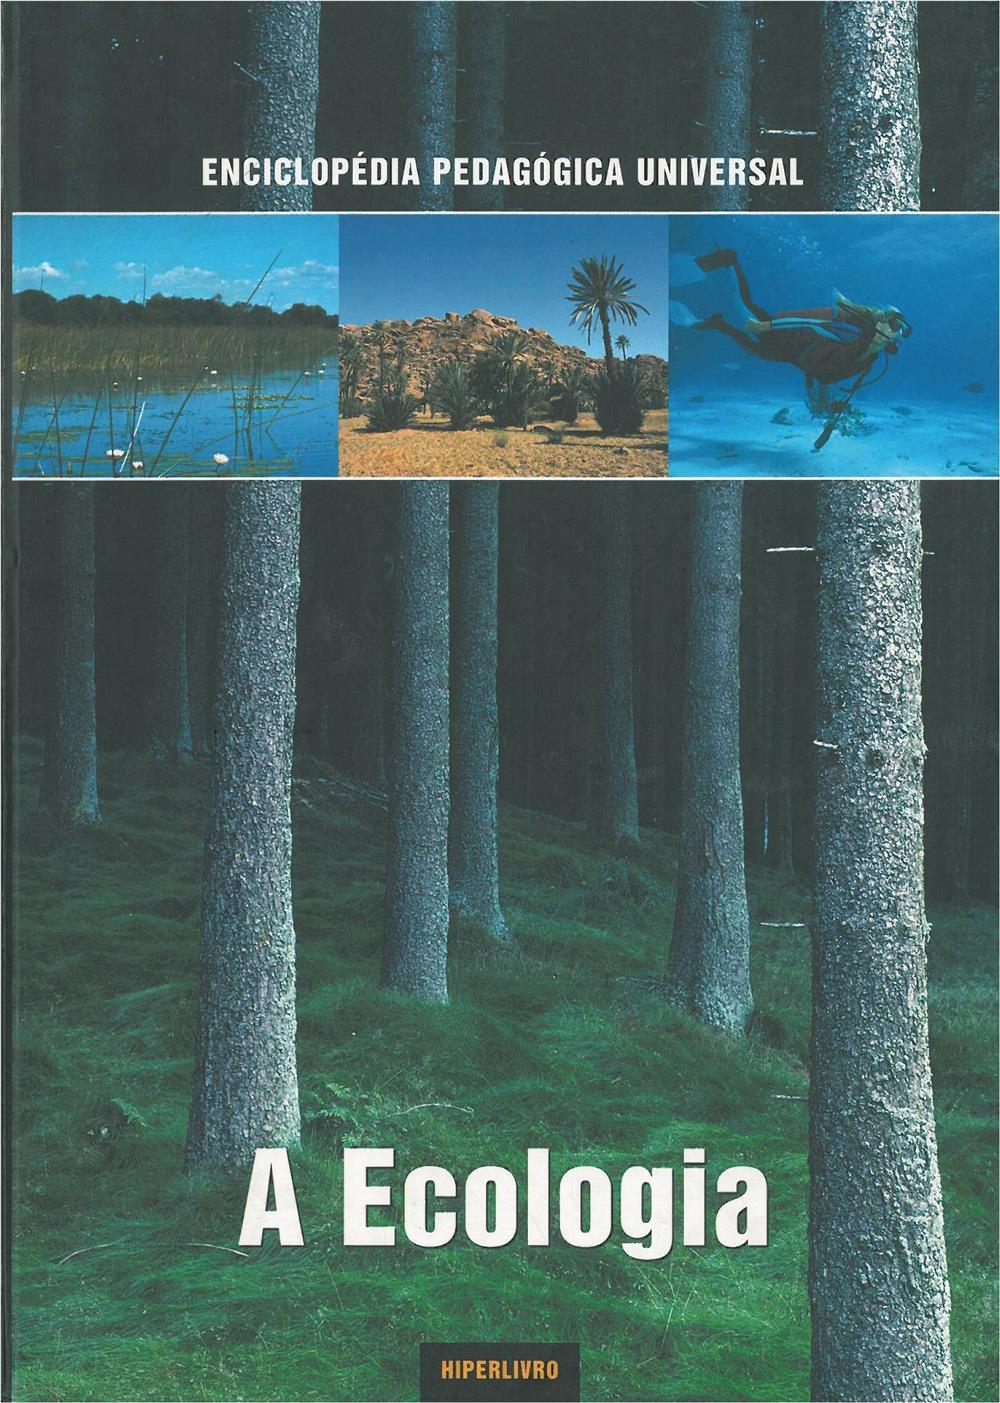 A ecologia.jpg